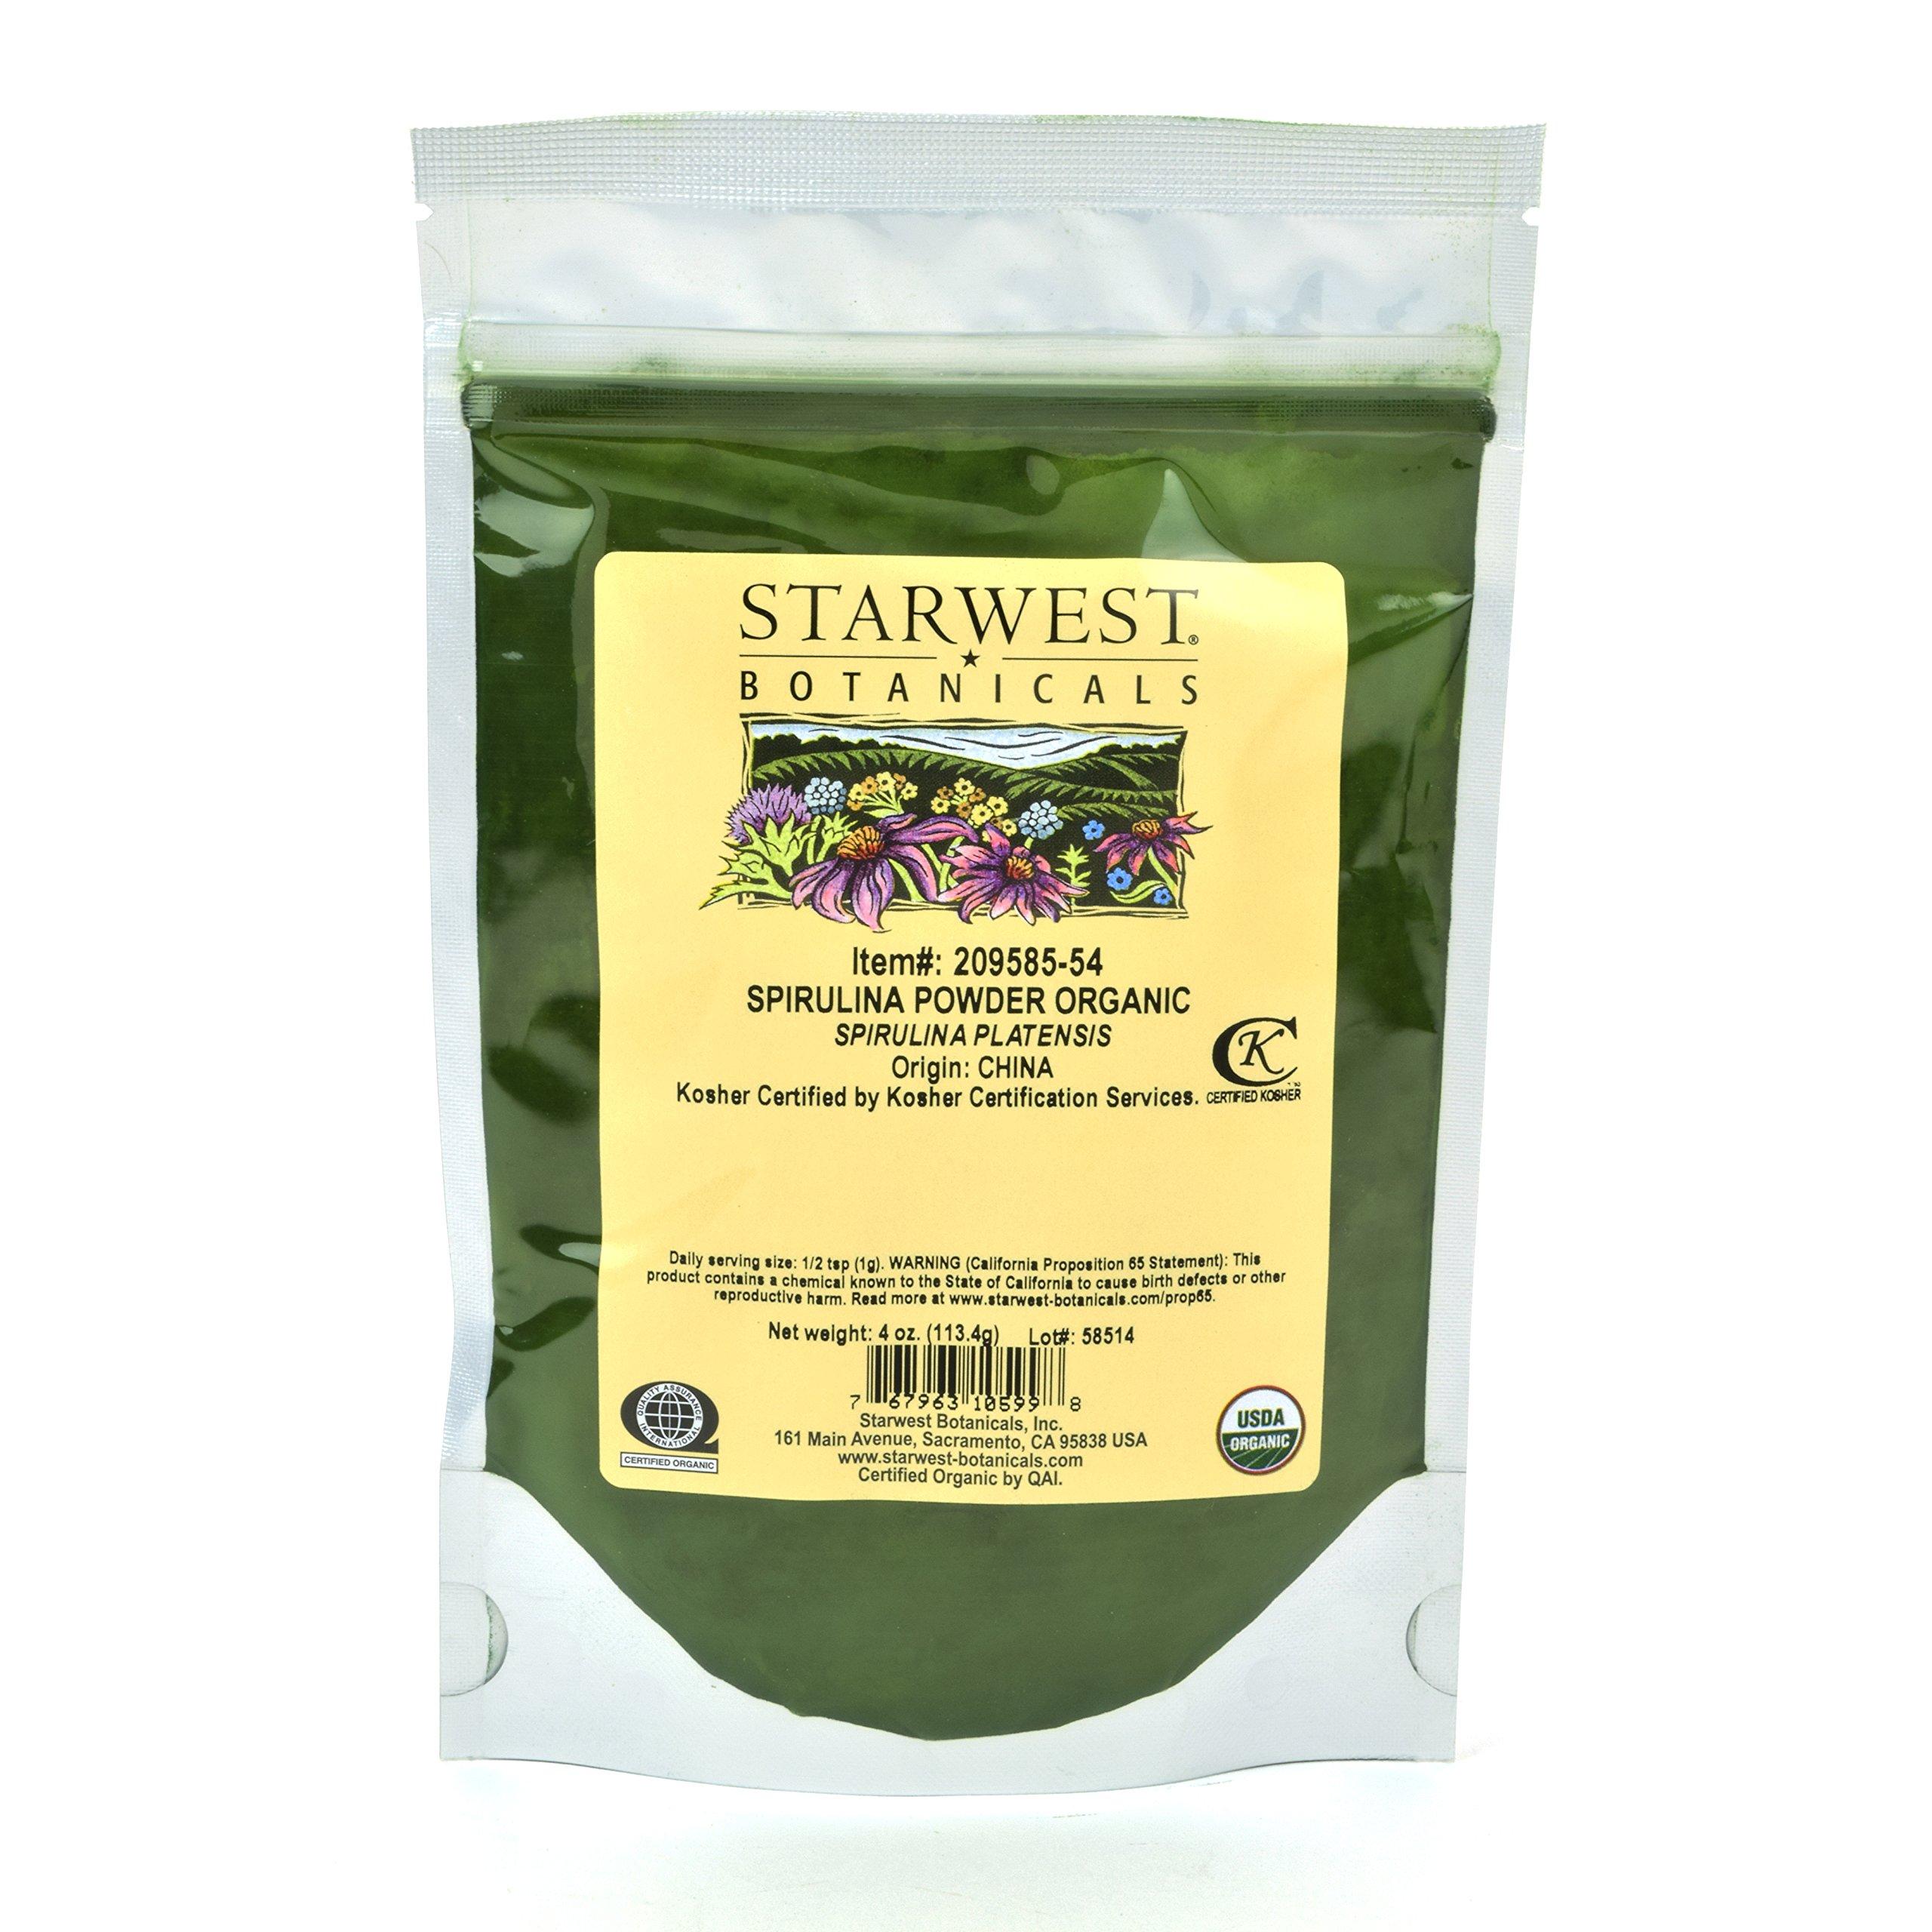 Starwest Botanicals Organic Spirulina Powder, 4 Ounces